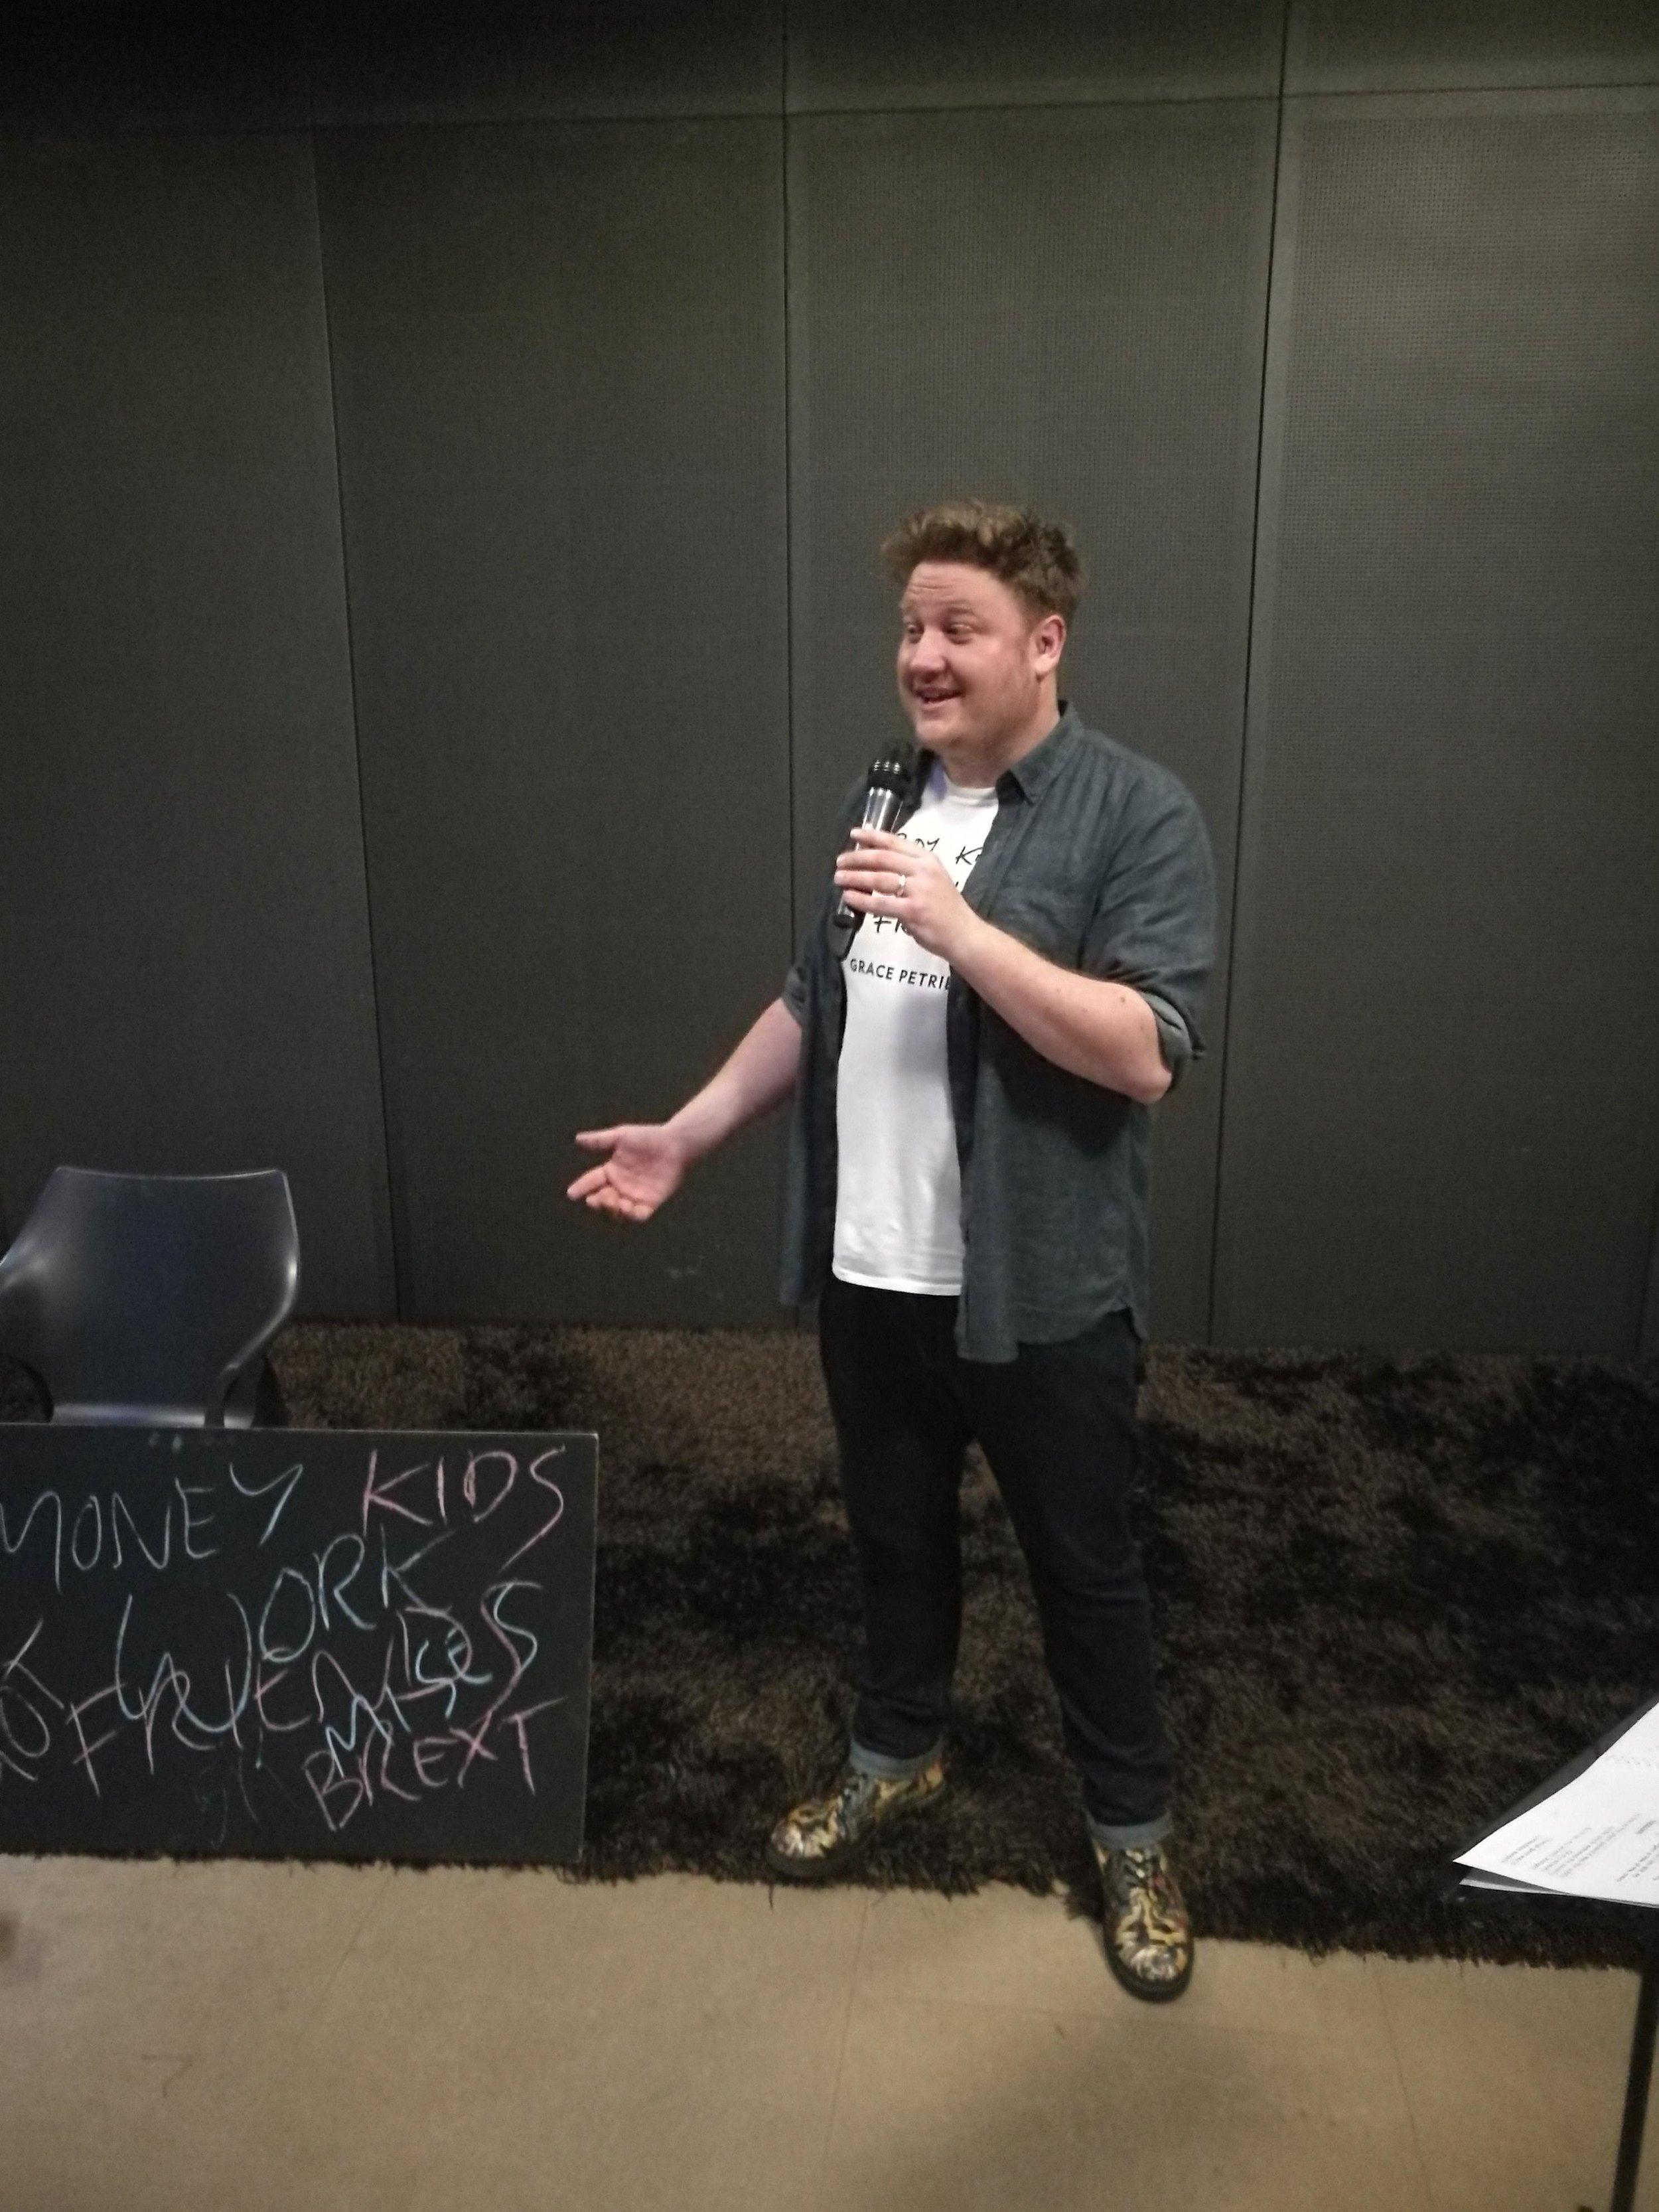 Rain Dance Scratch as part of the Little Ed Fringe, Derby, 2018